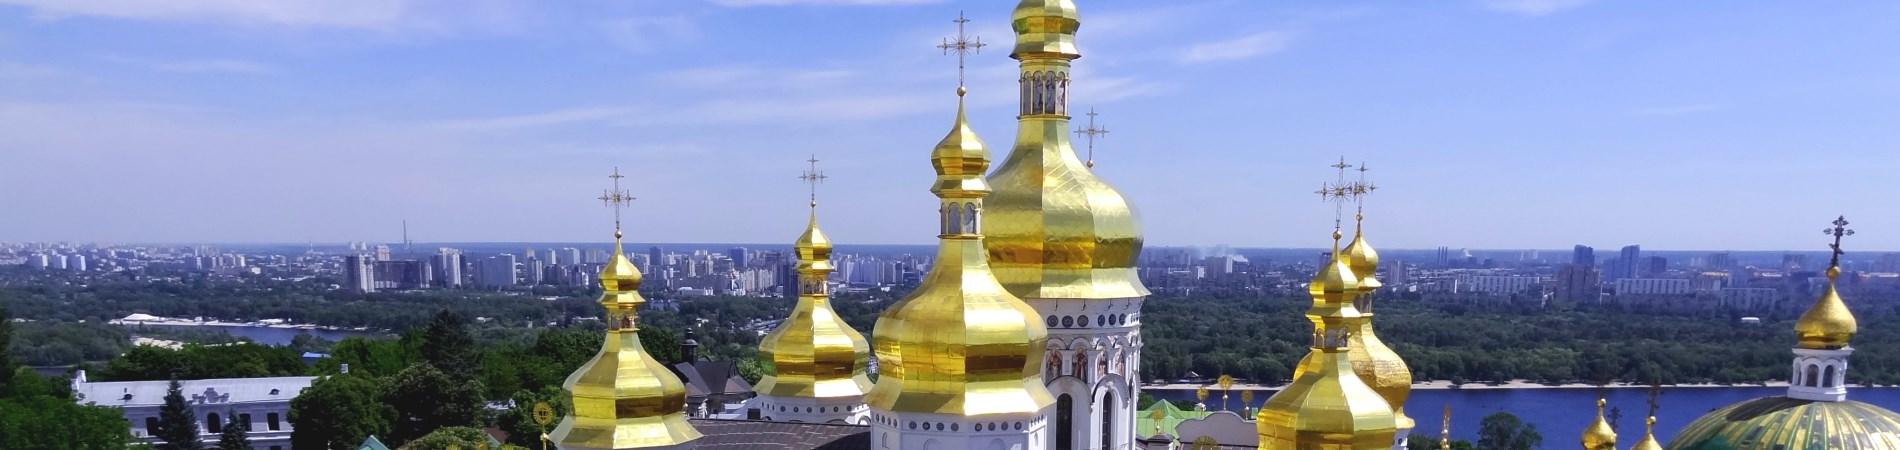 Lavra Holenklooster, werelderfgoed in Kiev